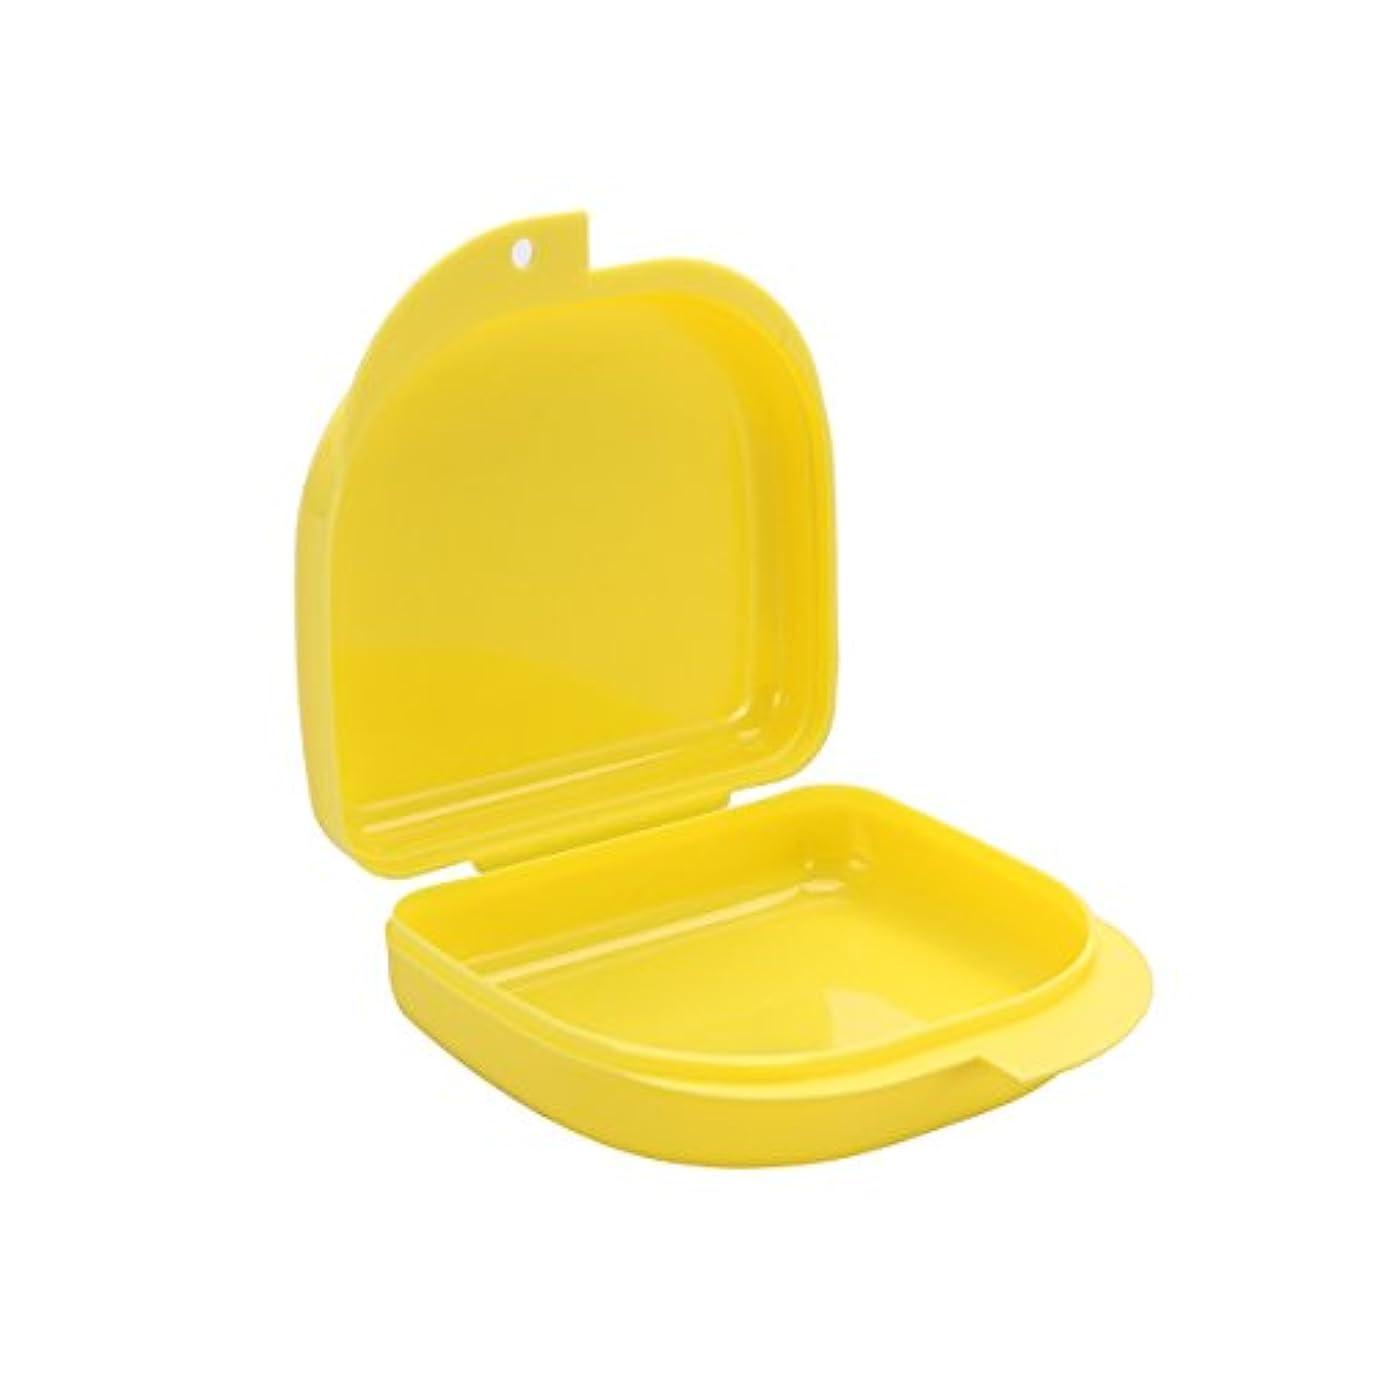 ROSENICE 義歯ケース口ガードケース義歯ボックス義歯収納容器(黄色)